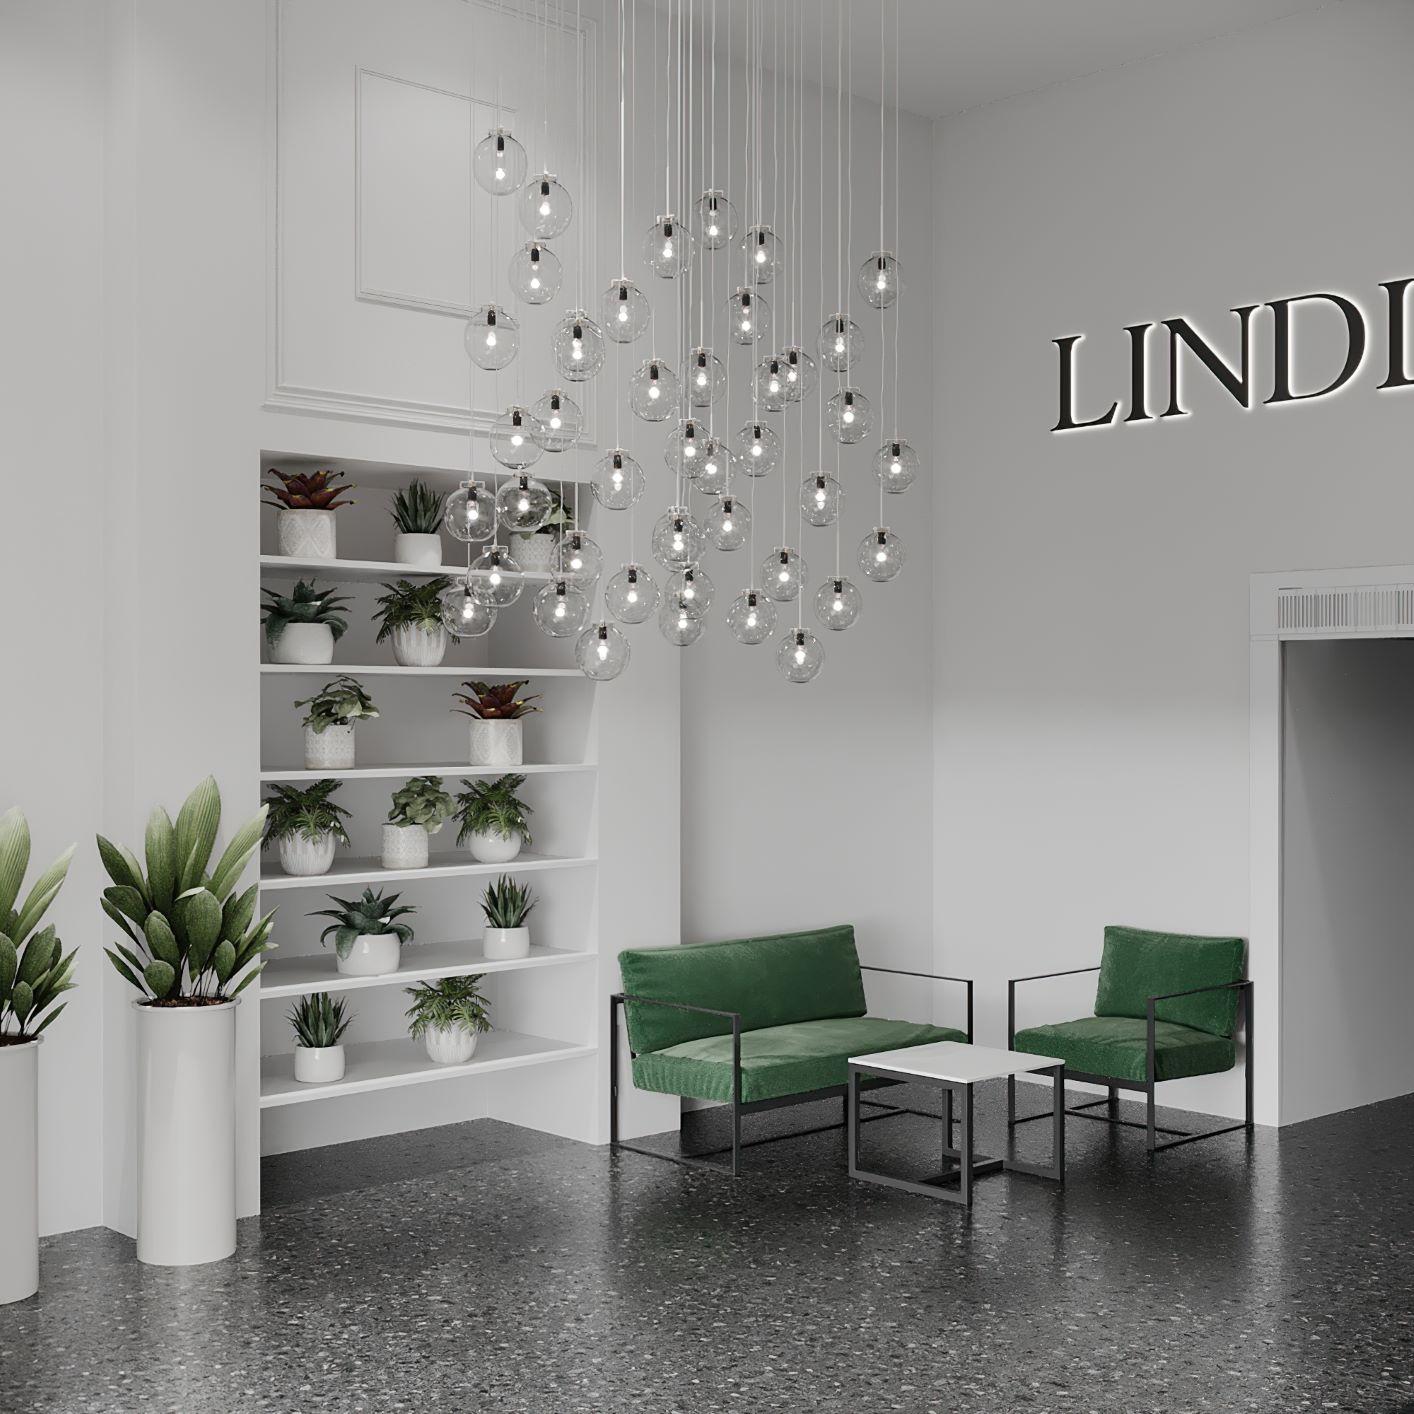 LINDLEYA 16 - zdjęcie 2